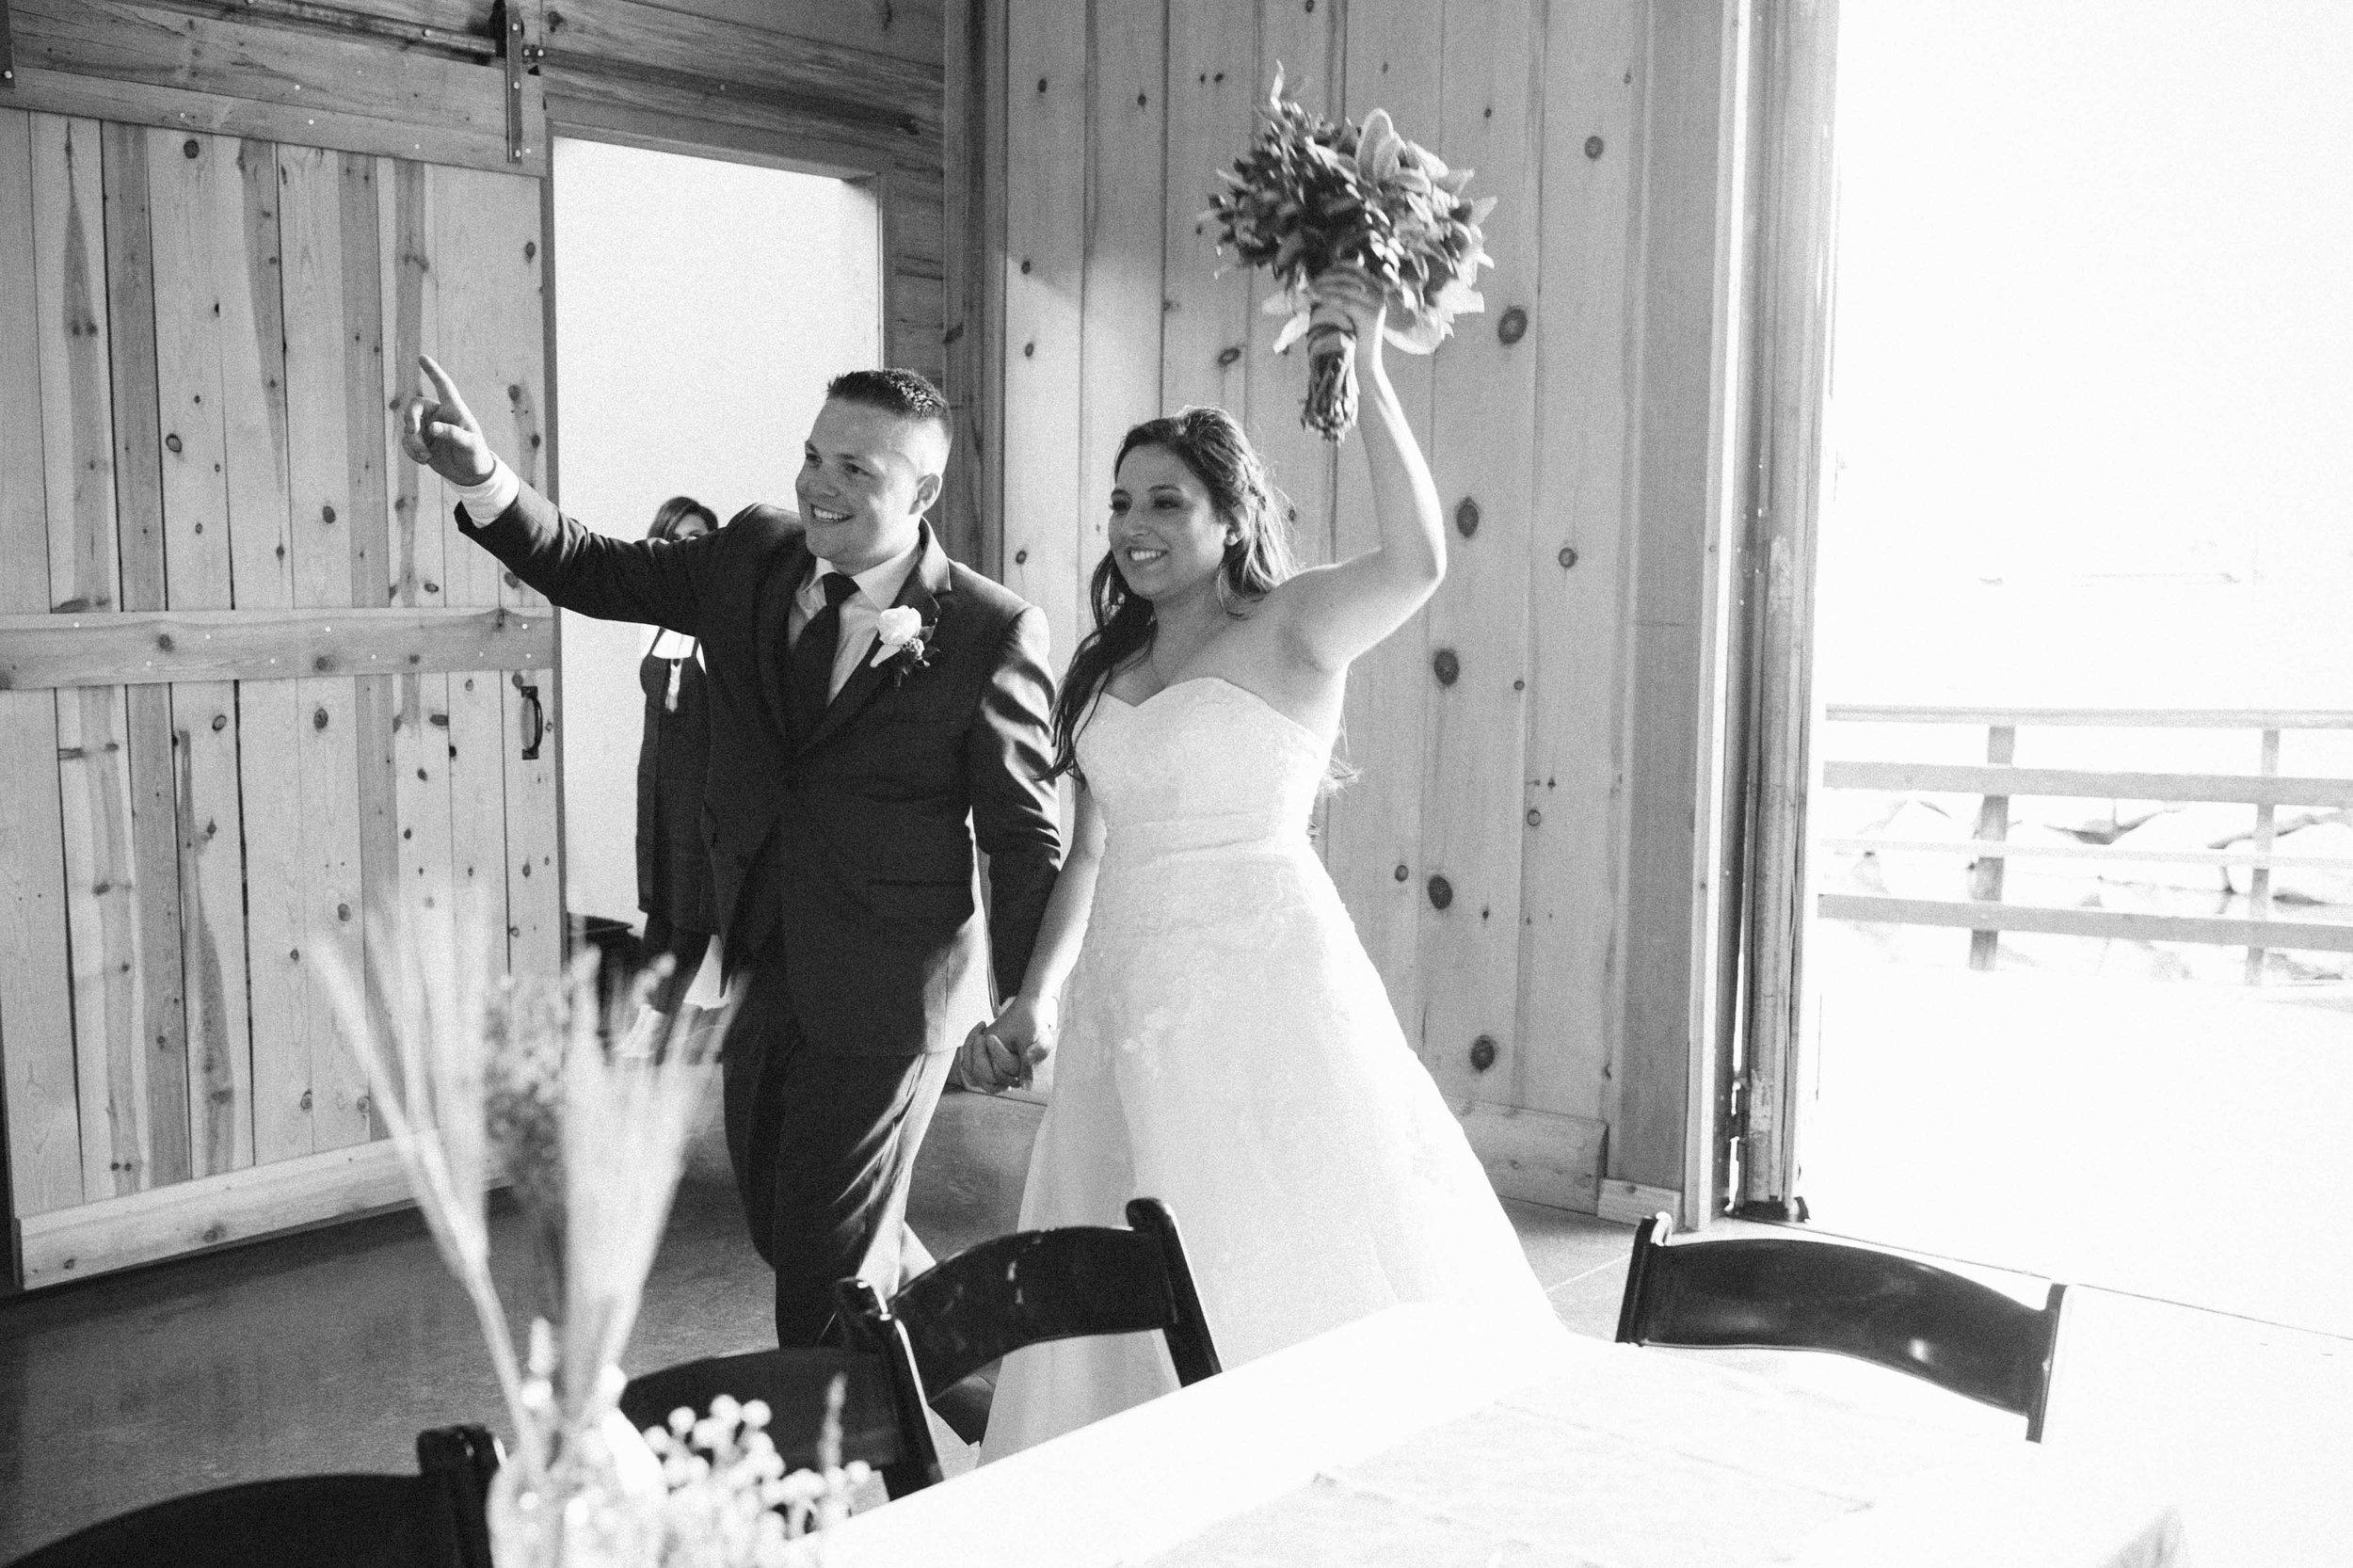 tuncannon-cellars-wedding-85.jpg